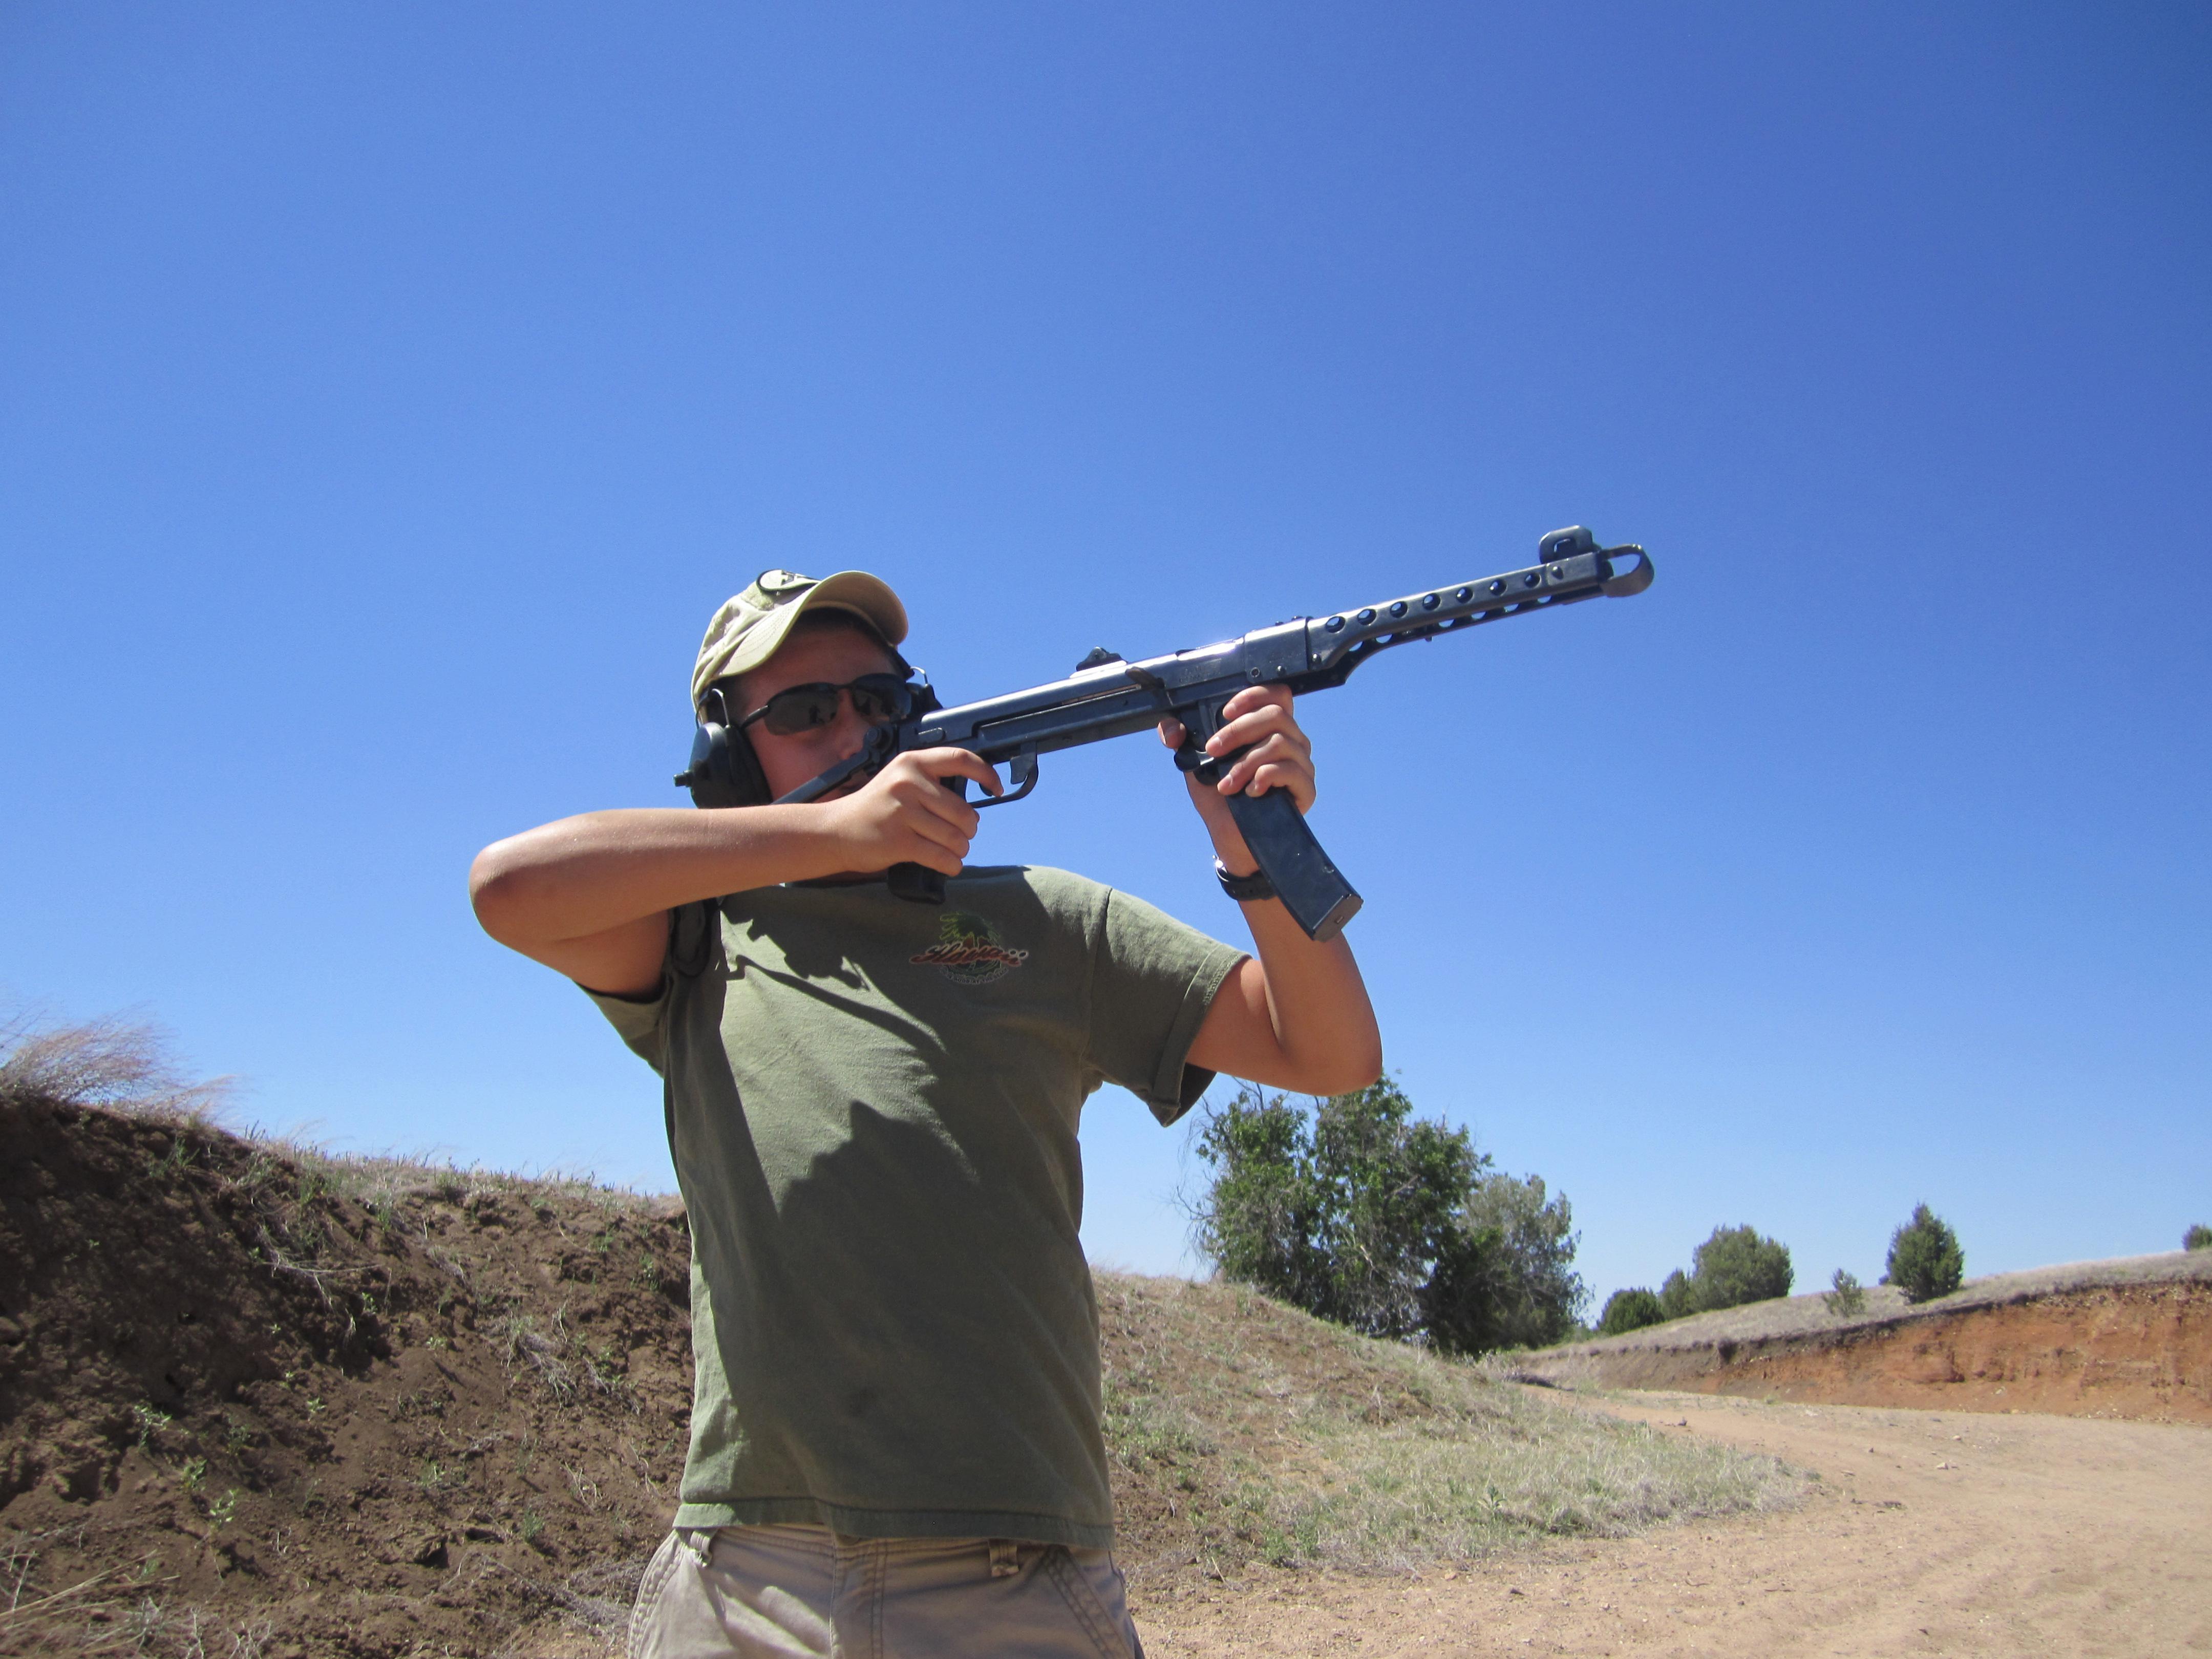 GABE SUAREZ BLOG - The PPS-43: Study Gun, Kid's Gun